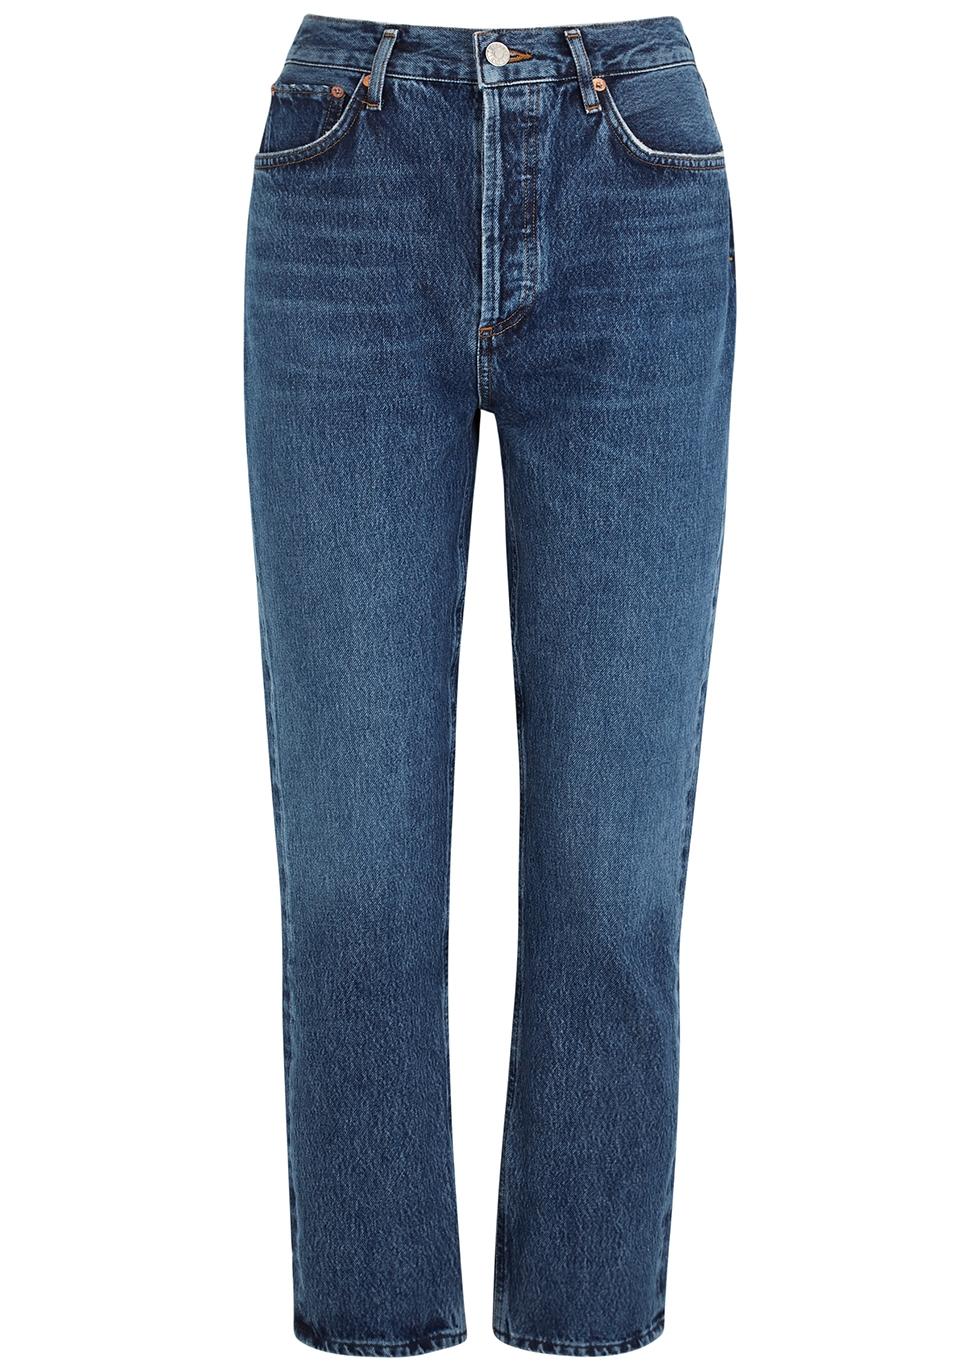 Riley blue straight-leg jeans